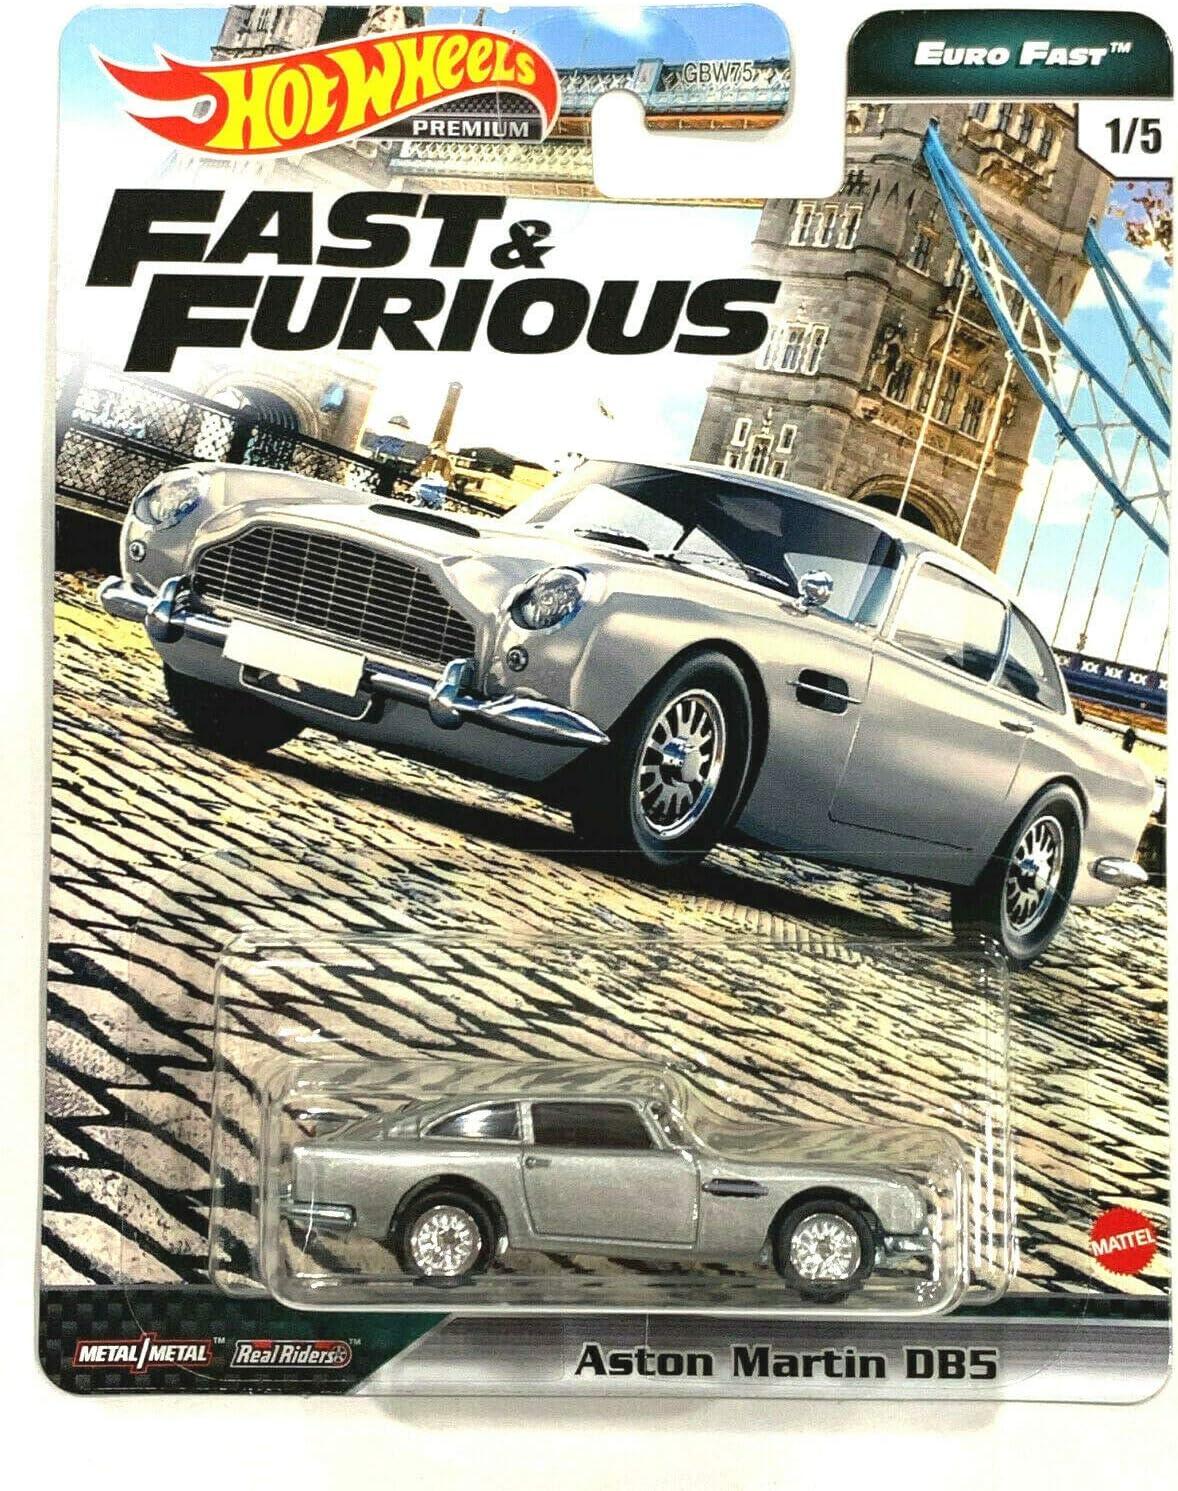 Amazon Com Diecast Hotwheels Fast Furious Euro Fast 1 5 Aston Martin Db5 Silver Toys Games